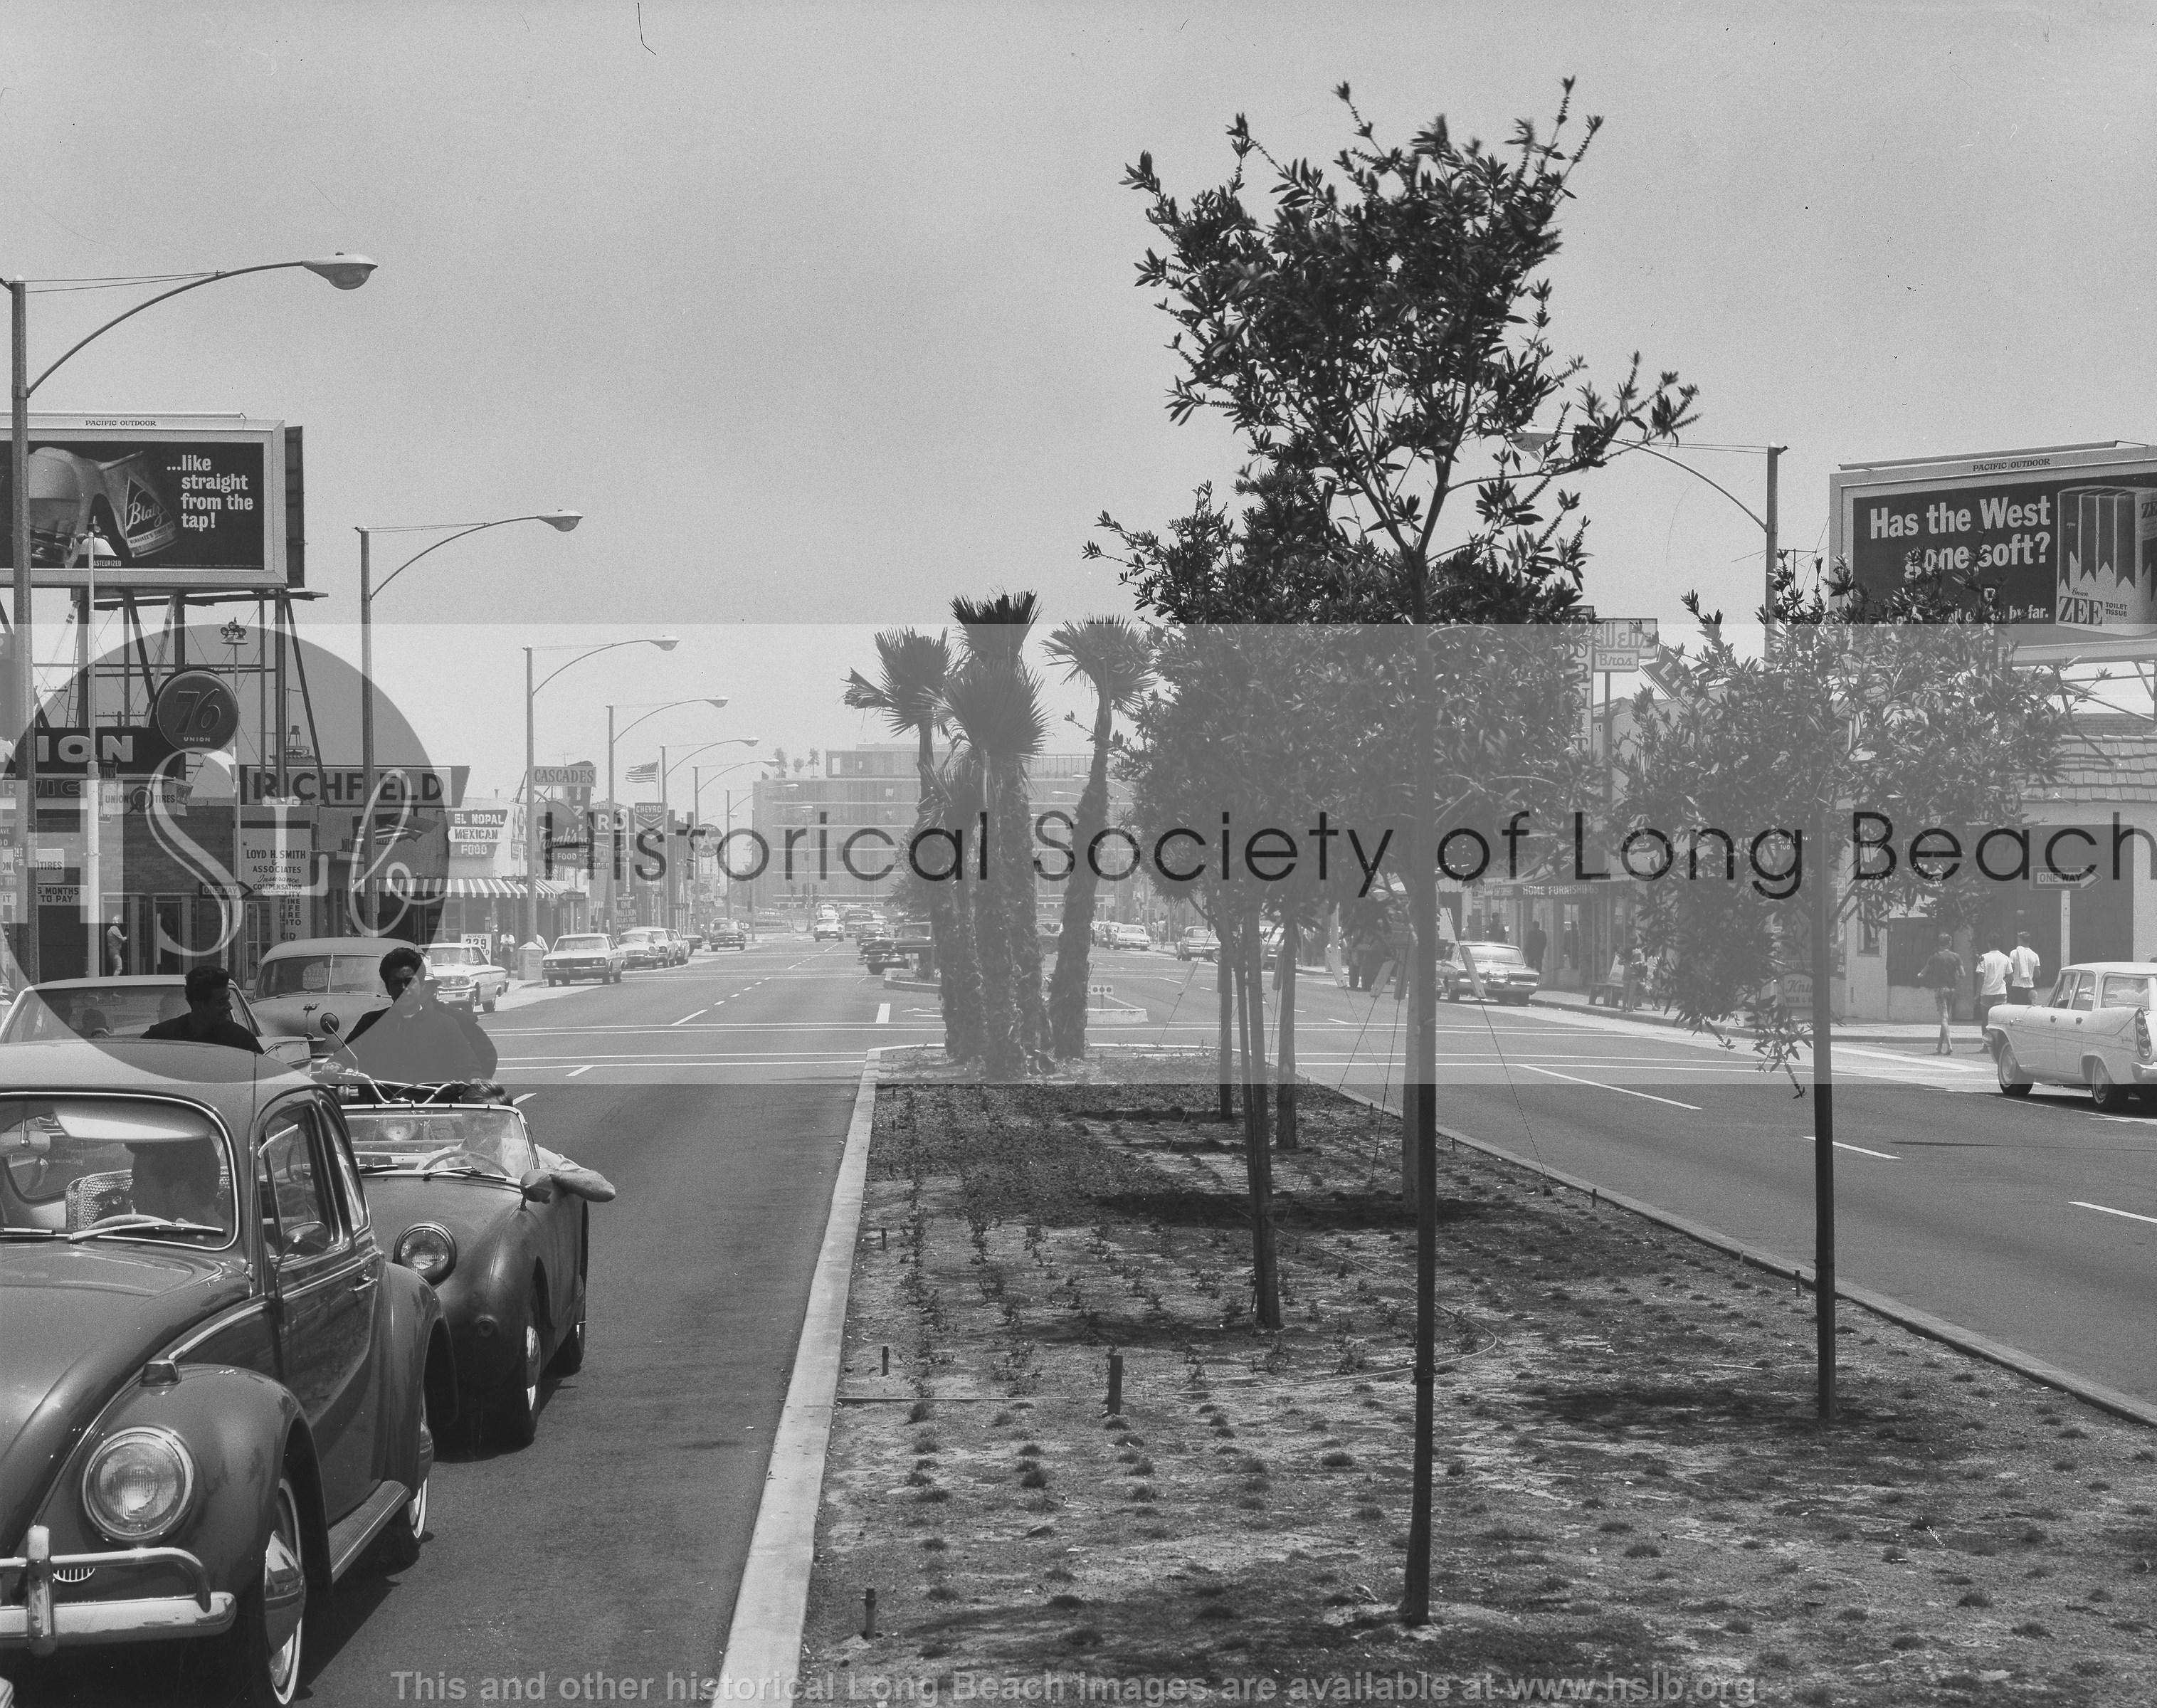 Second Street, 1980s vintage photograph